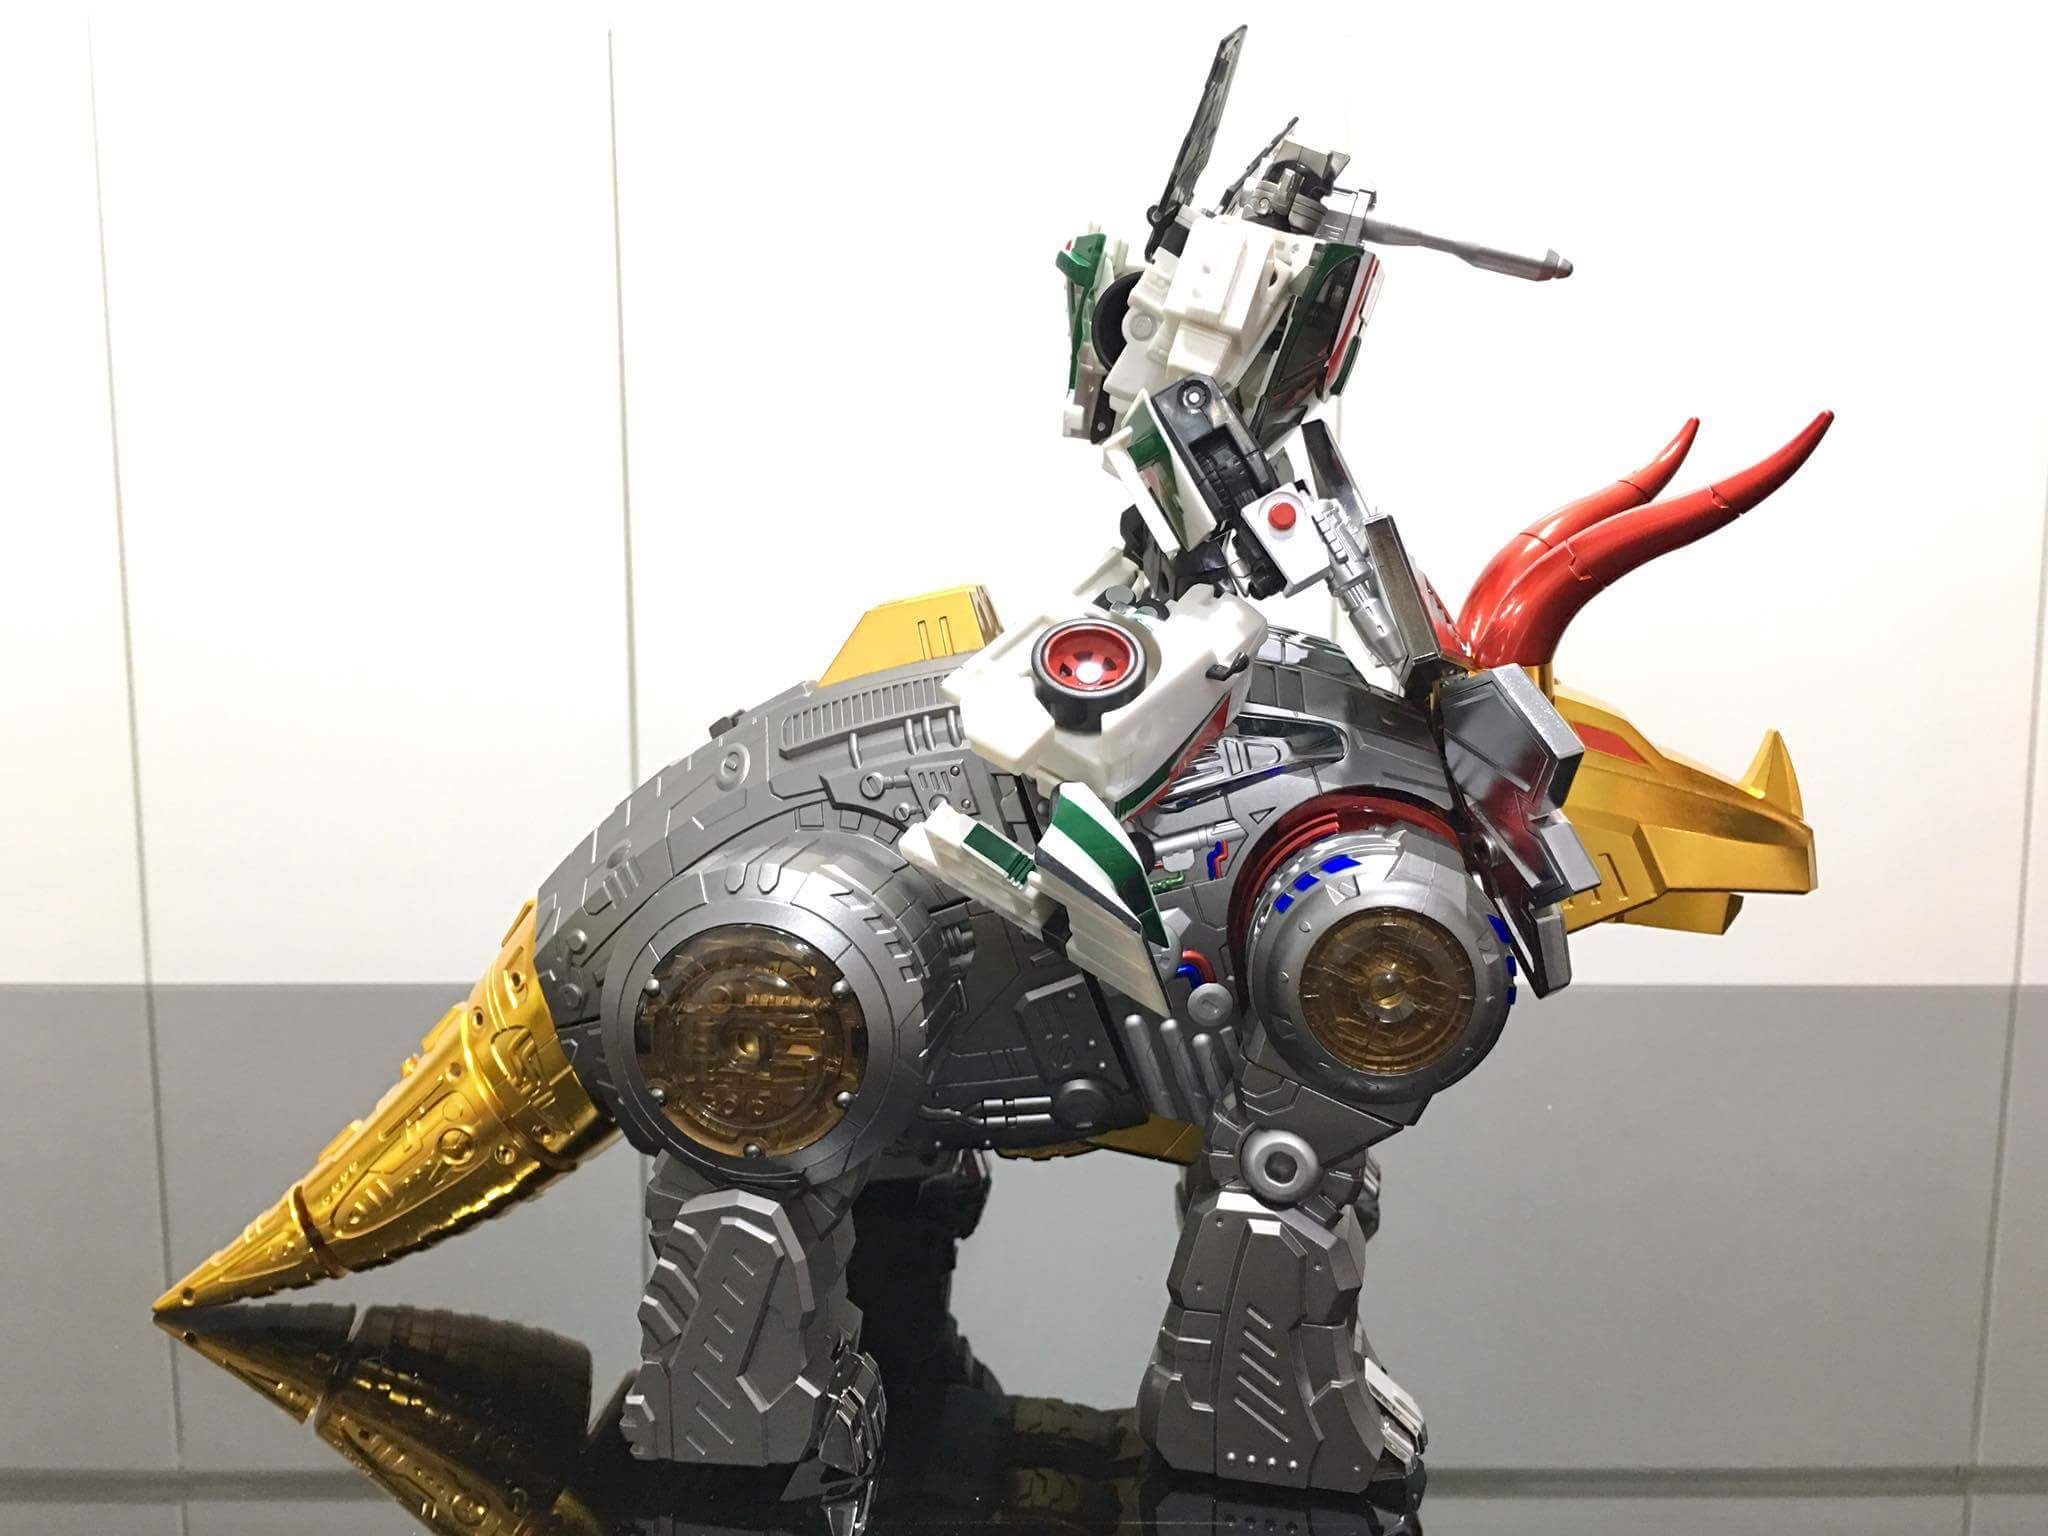 [GigaPower] Produit Tiers - Jouets HQ-01 Superator + HQ-02 Grassor + HQ-03 Guttur + HQ-04 Graviter + HQ-05 Gaudenter - aka Dinobots - Page 4 BF1Qii0y